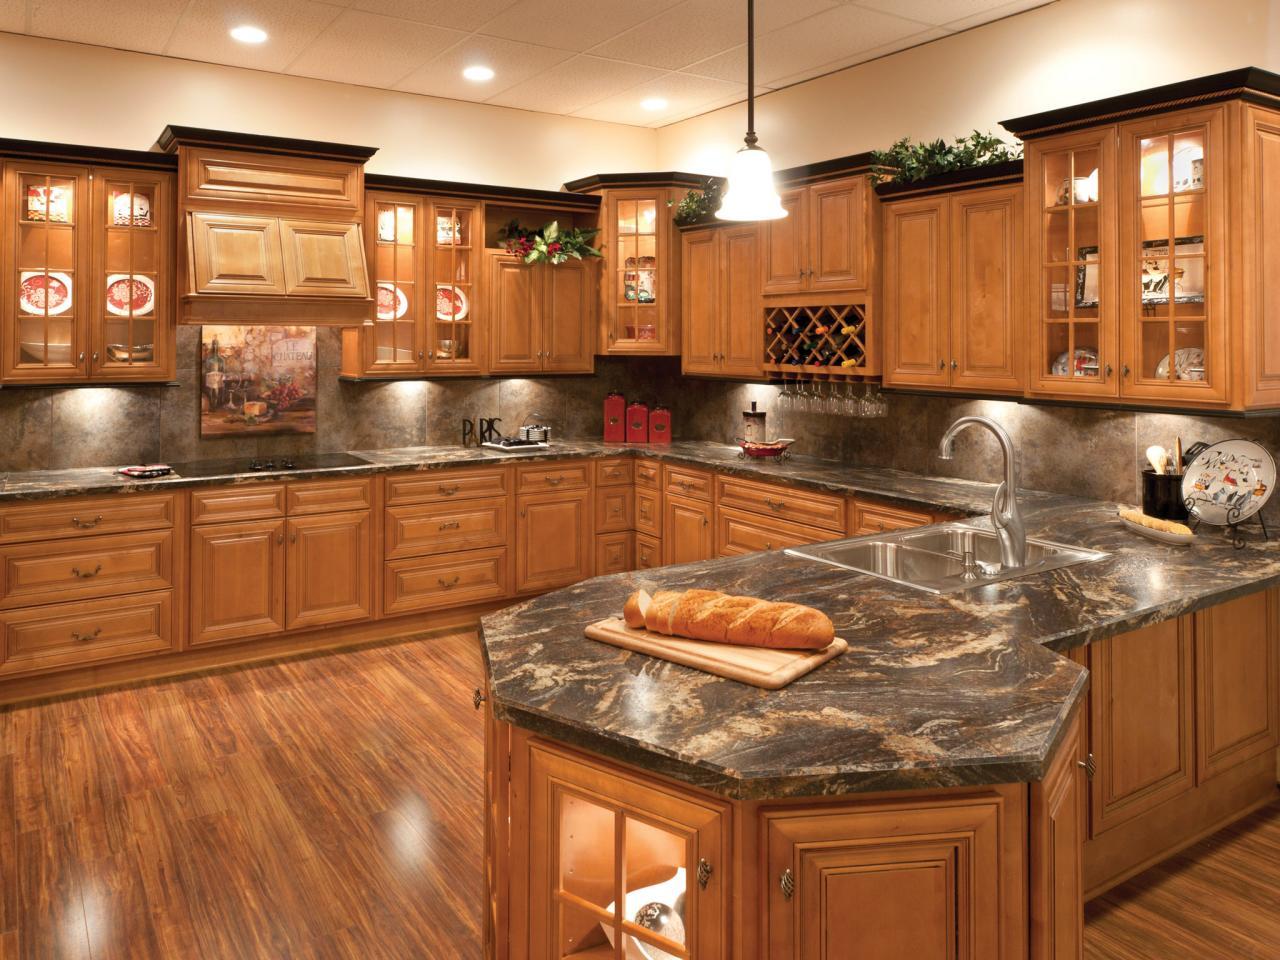 Bargain outlet hgtv for Kitchen cabinets warehouse